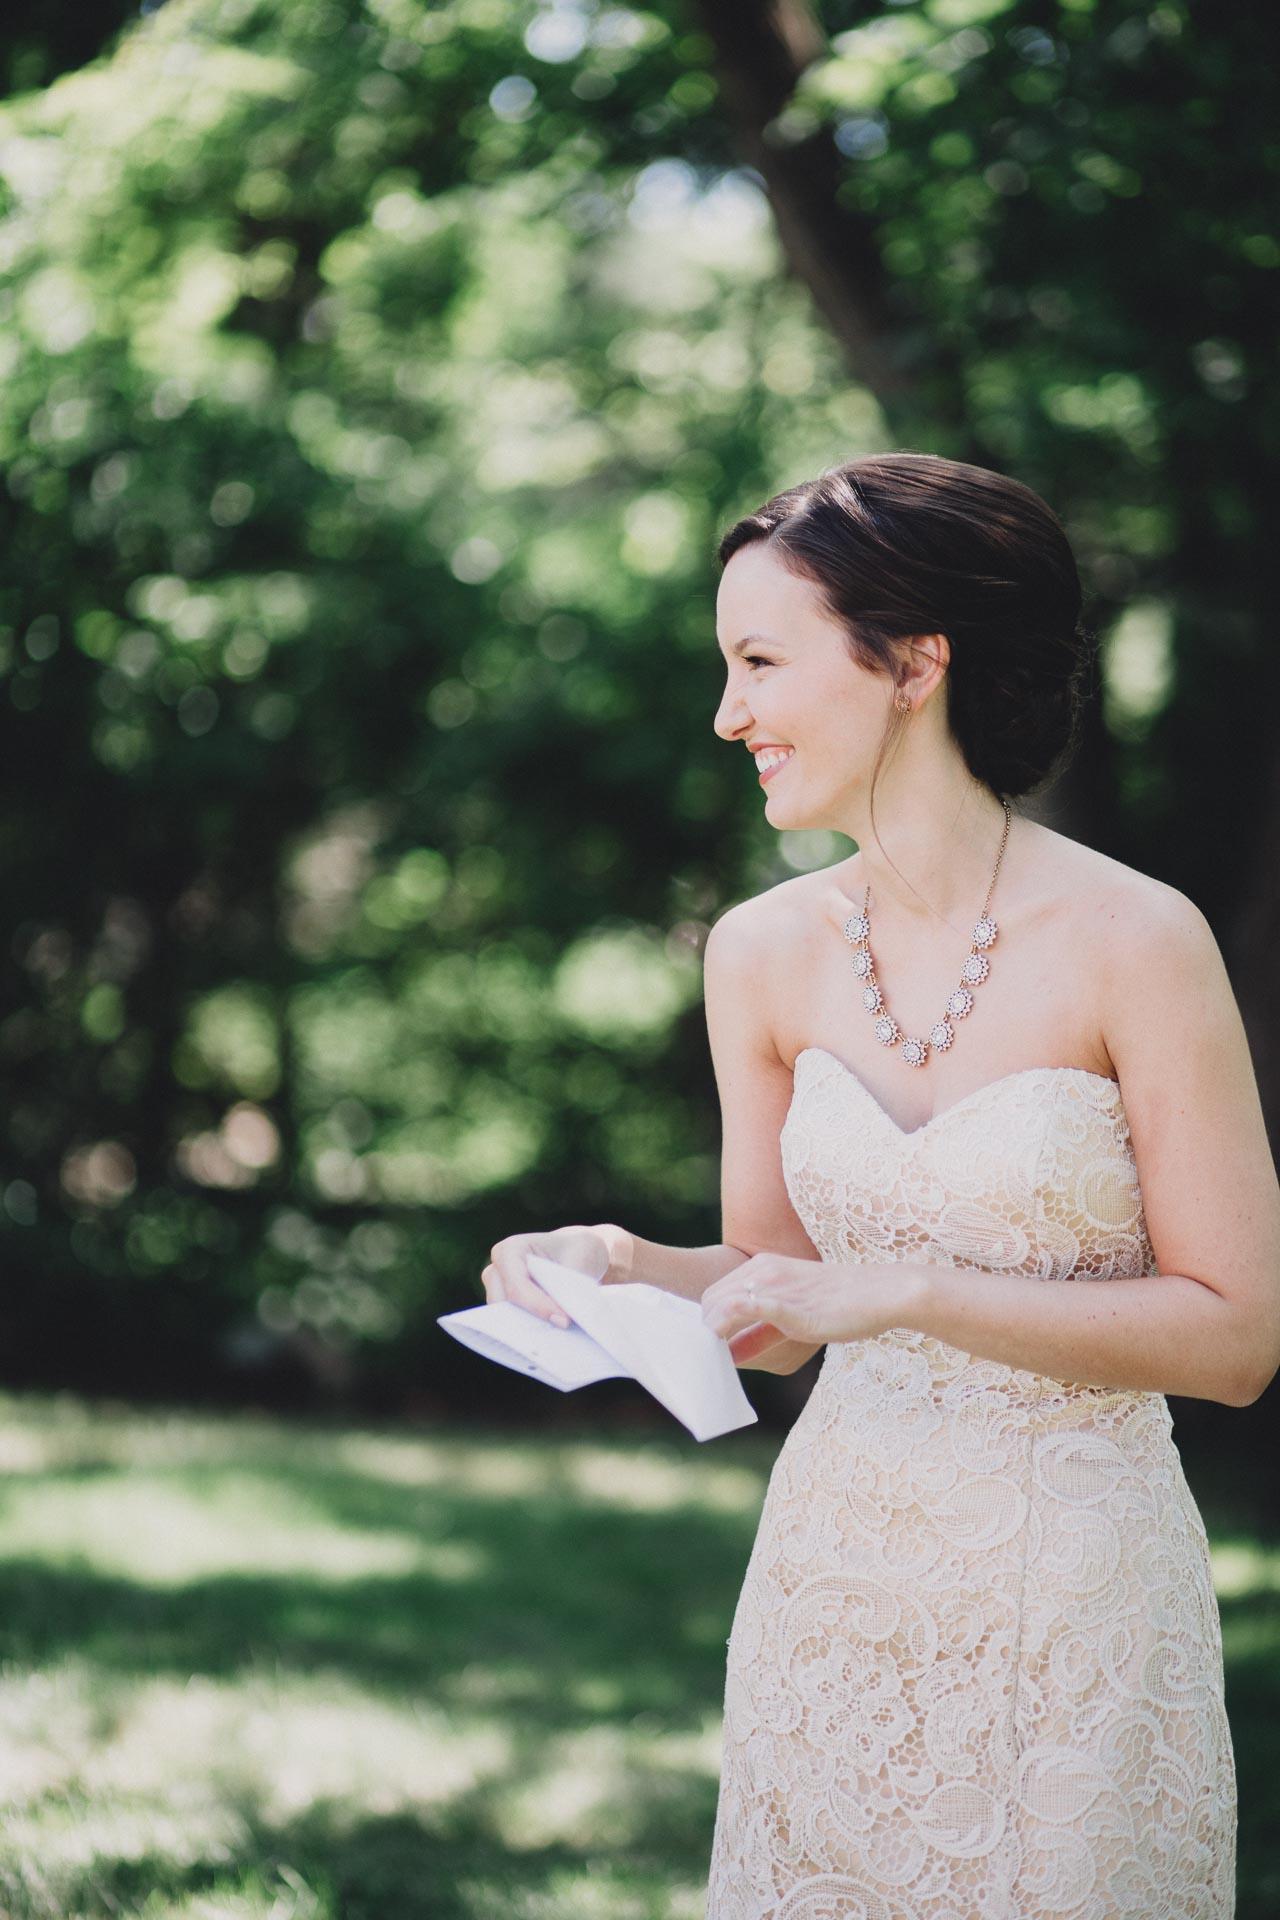 Julia-Michael-Cincinnati-Music-Hall-Wedding-031@2x.jpg